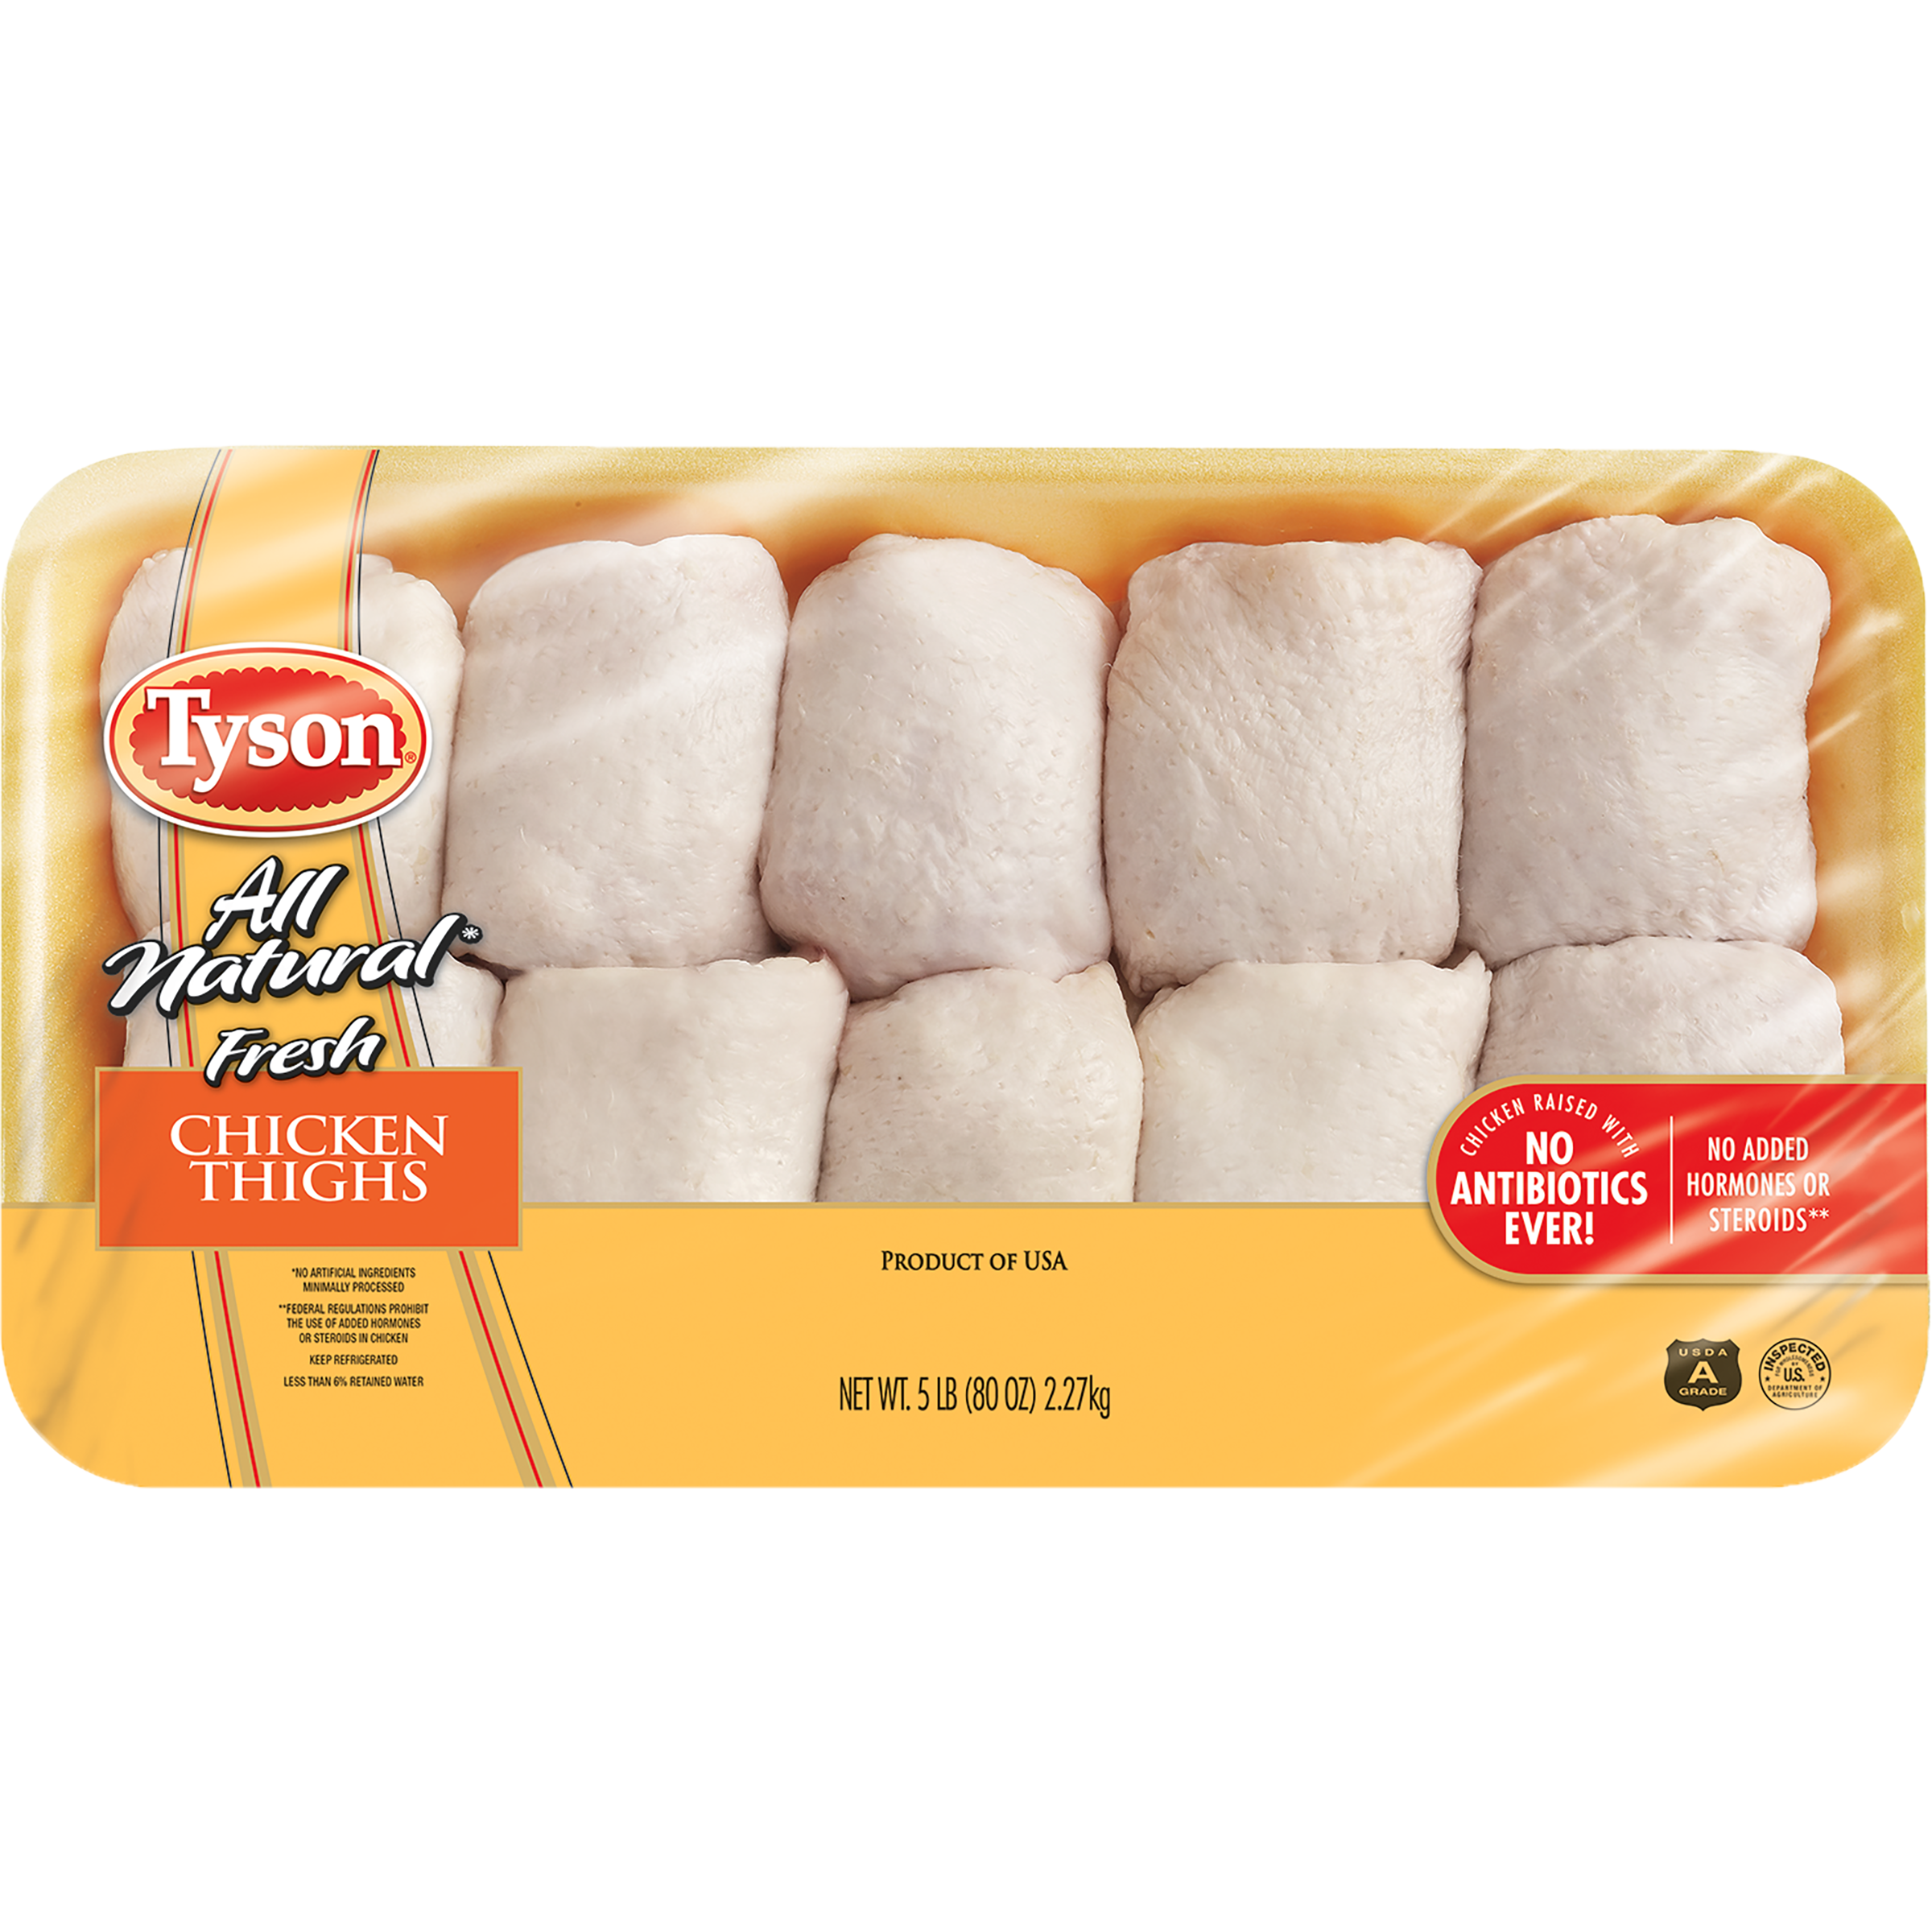 Tyson® All Natural Fresh Chicken Thighs, 5 lb